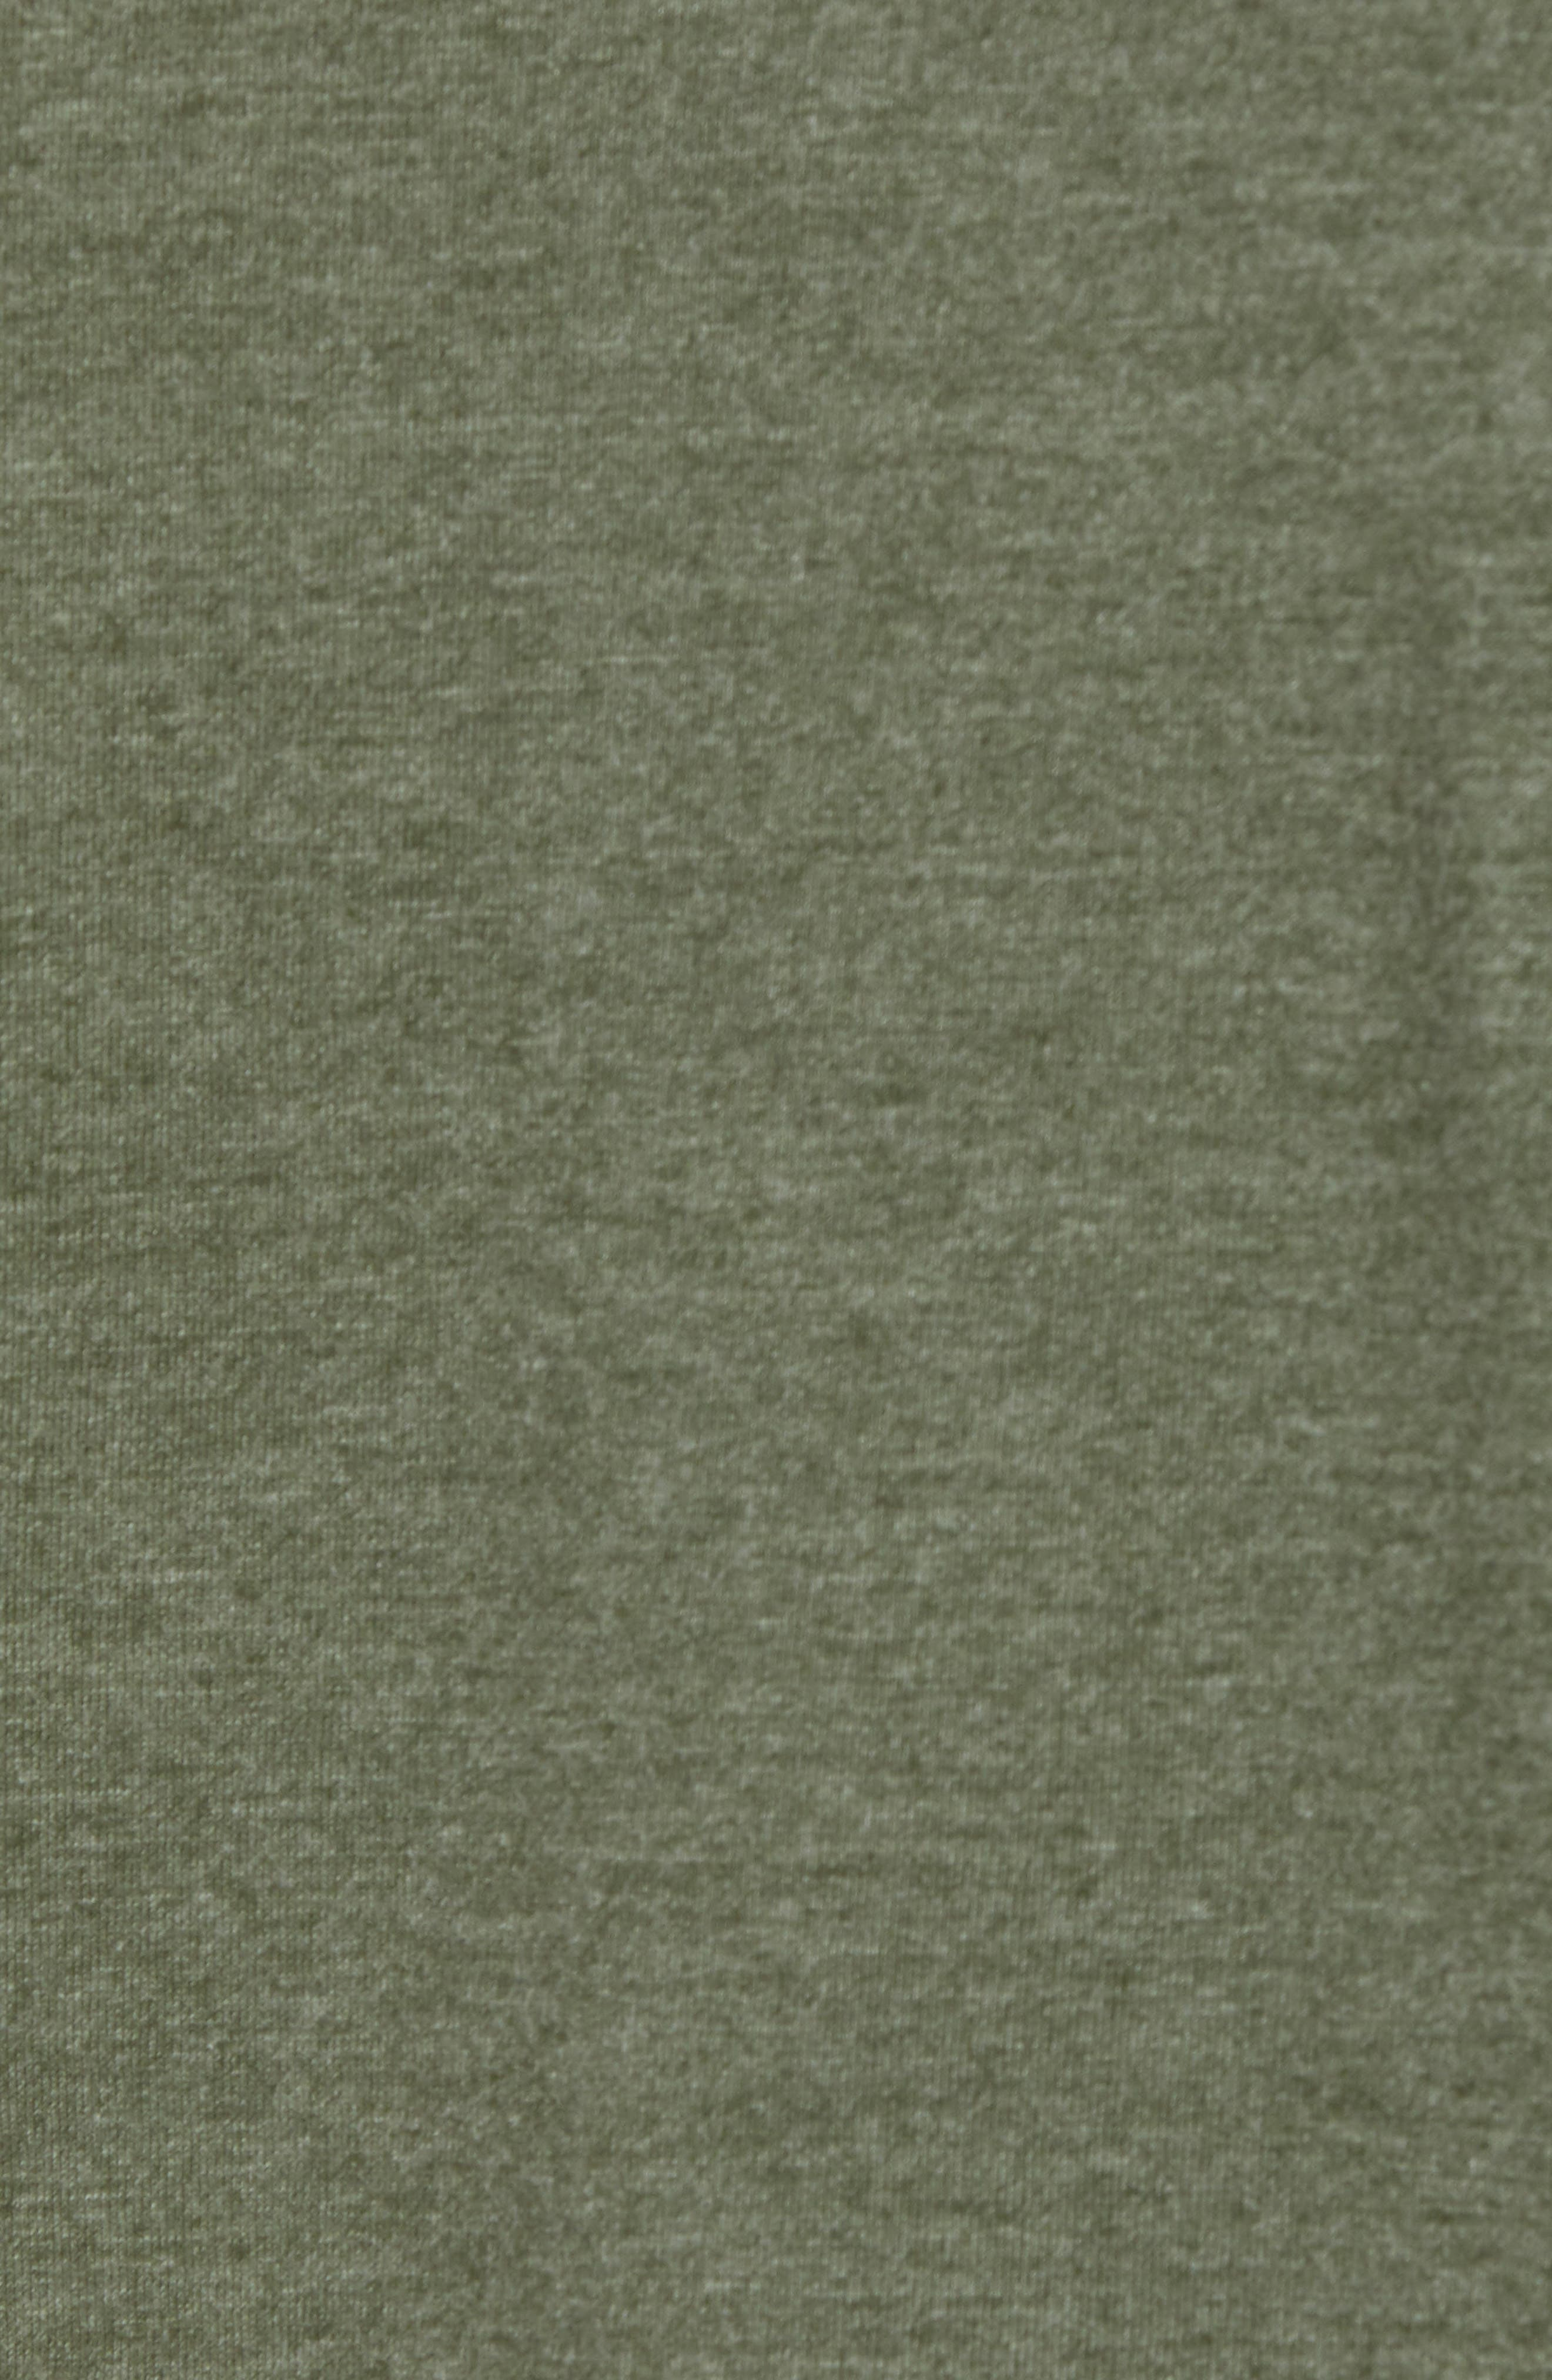 Perfomance T-Shirt,                             Alternate thumbnail 5, color,                             GREEN TACTICAL MELANGE